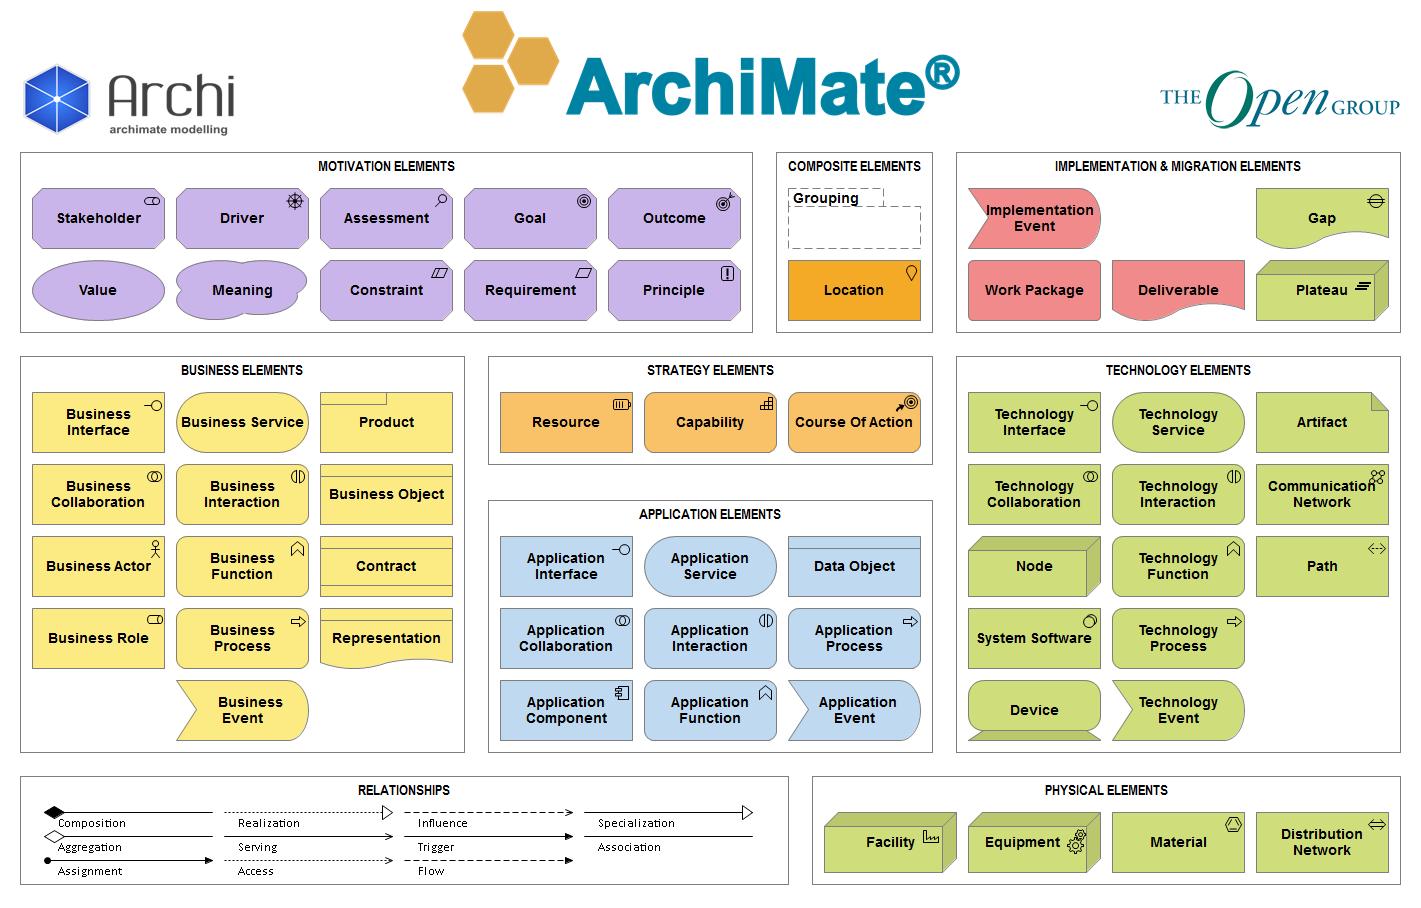 Archi 4 released – archi.